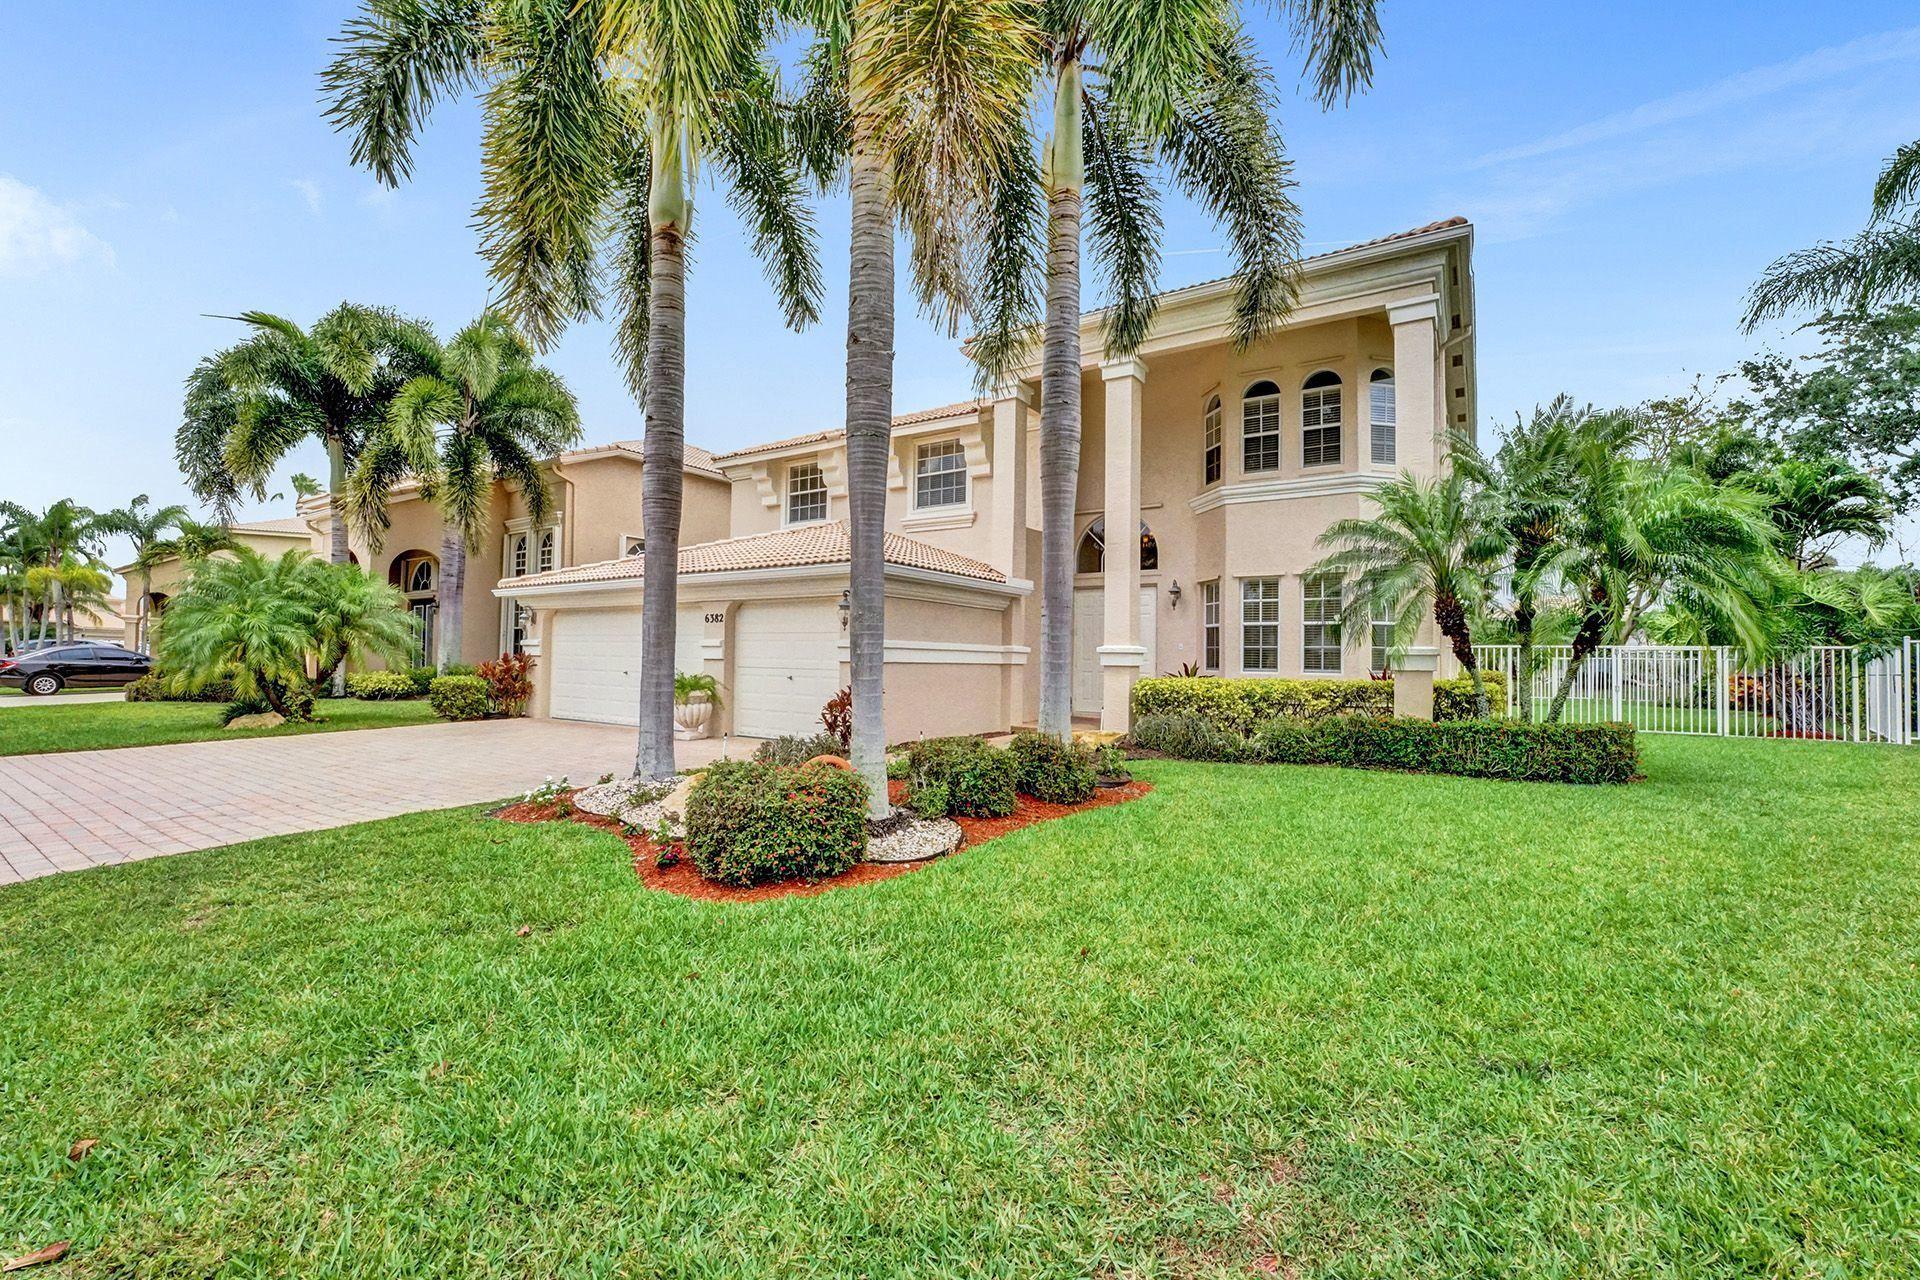 6382 Squirewood Way, Lake Worth, FL 33467 - MLS#: RX-10710269